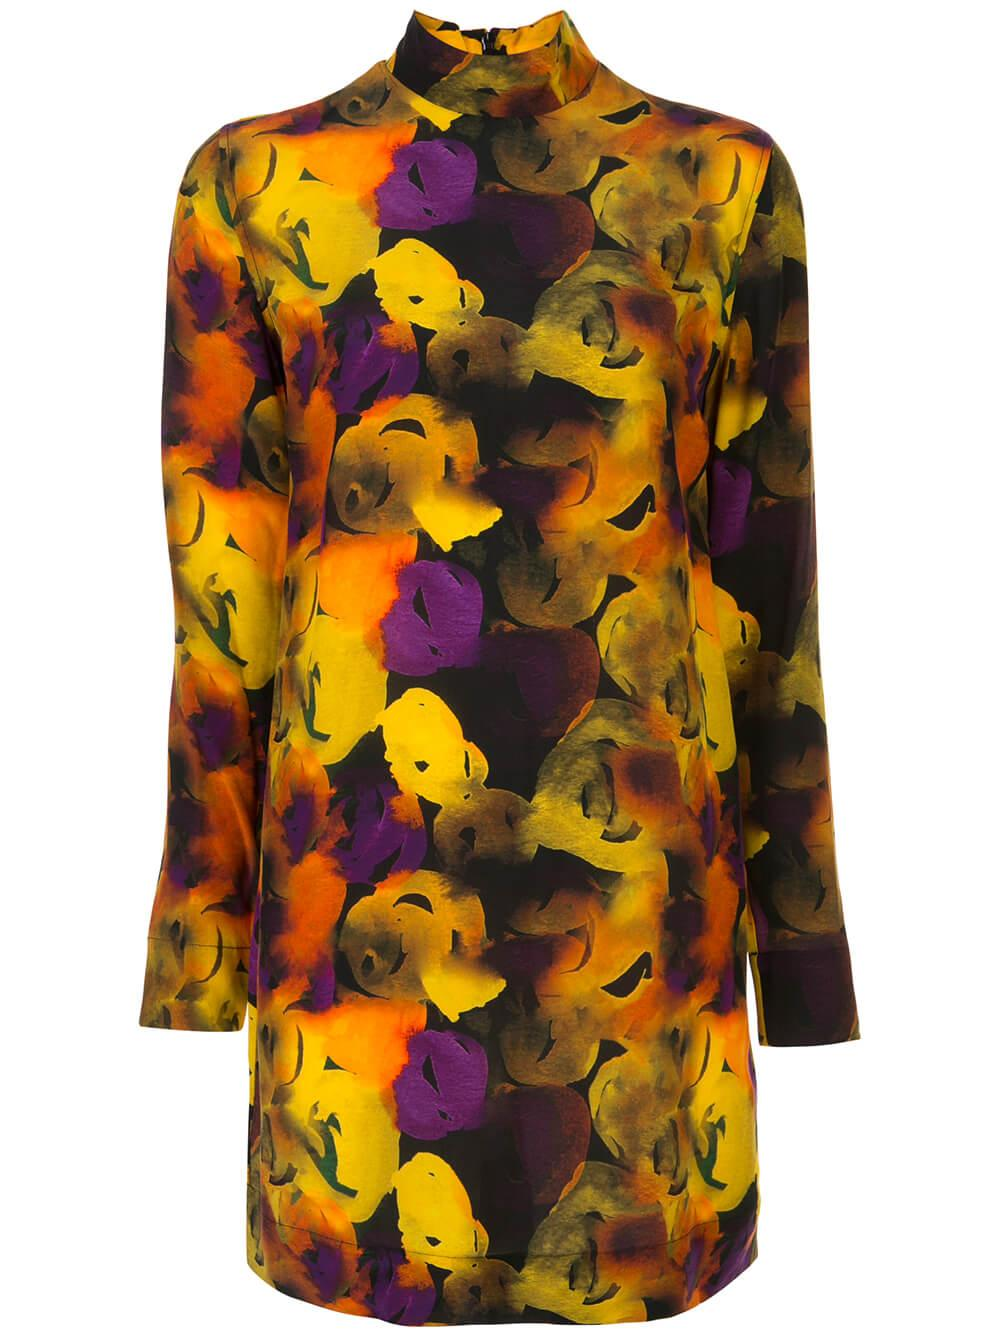 Silk Mix Lemon Print Dress Item # F4133